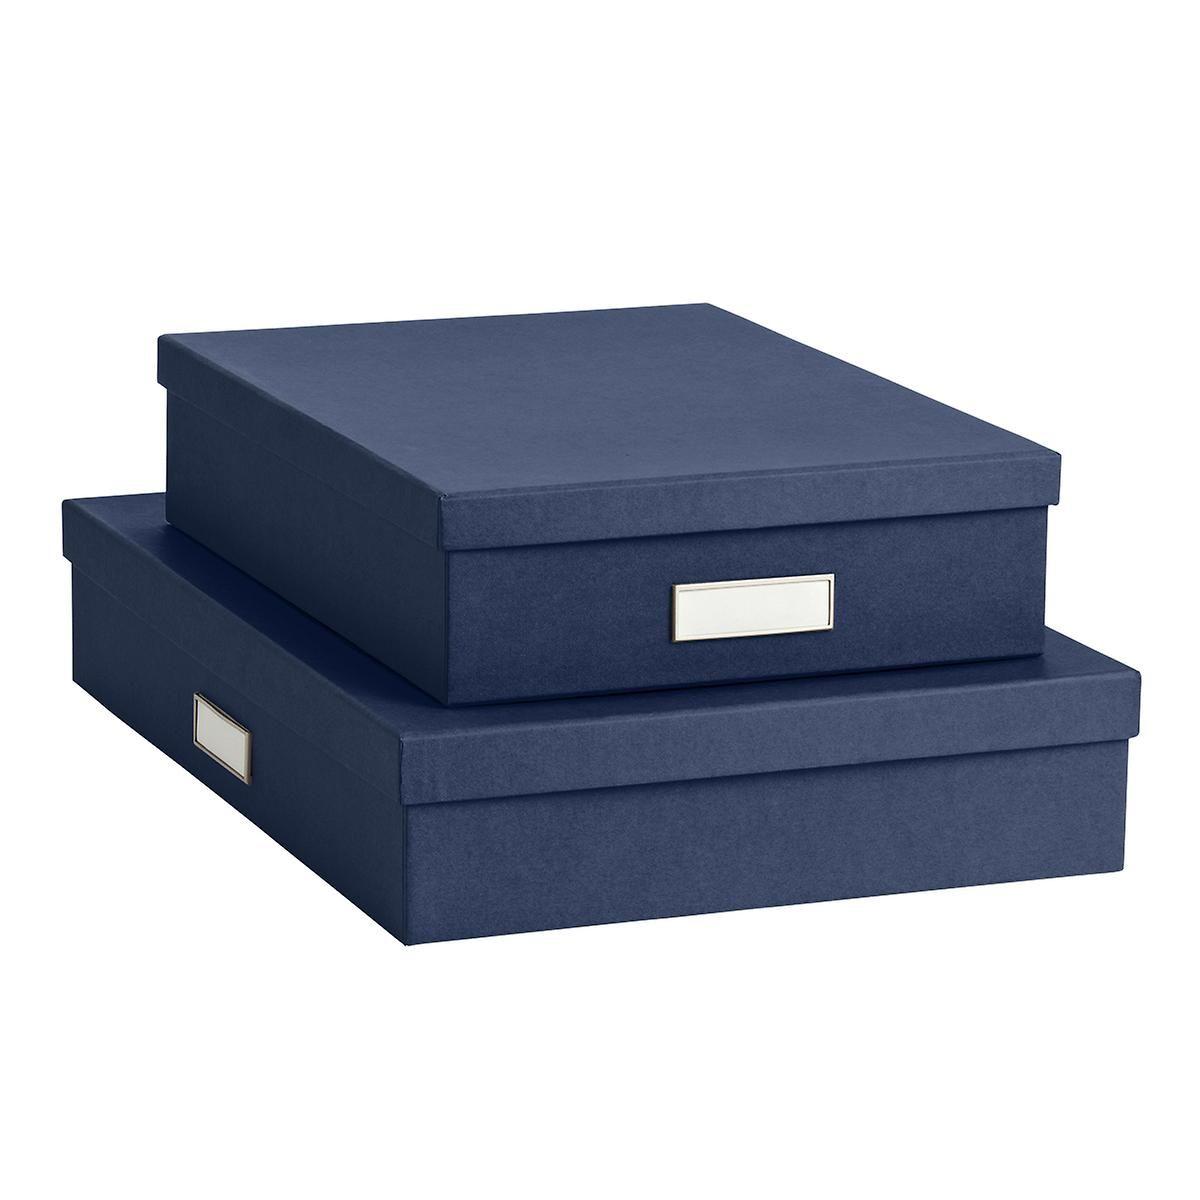 Bigso Navy Stockholm Office Storage Boxes The Container Store Storage Boxes Office Storage Metal Storage Box